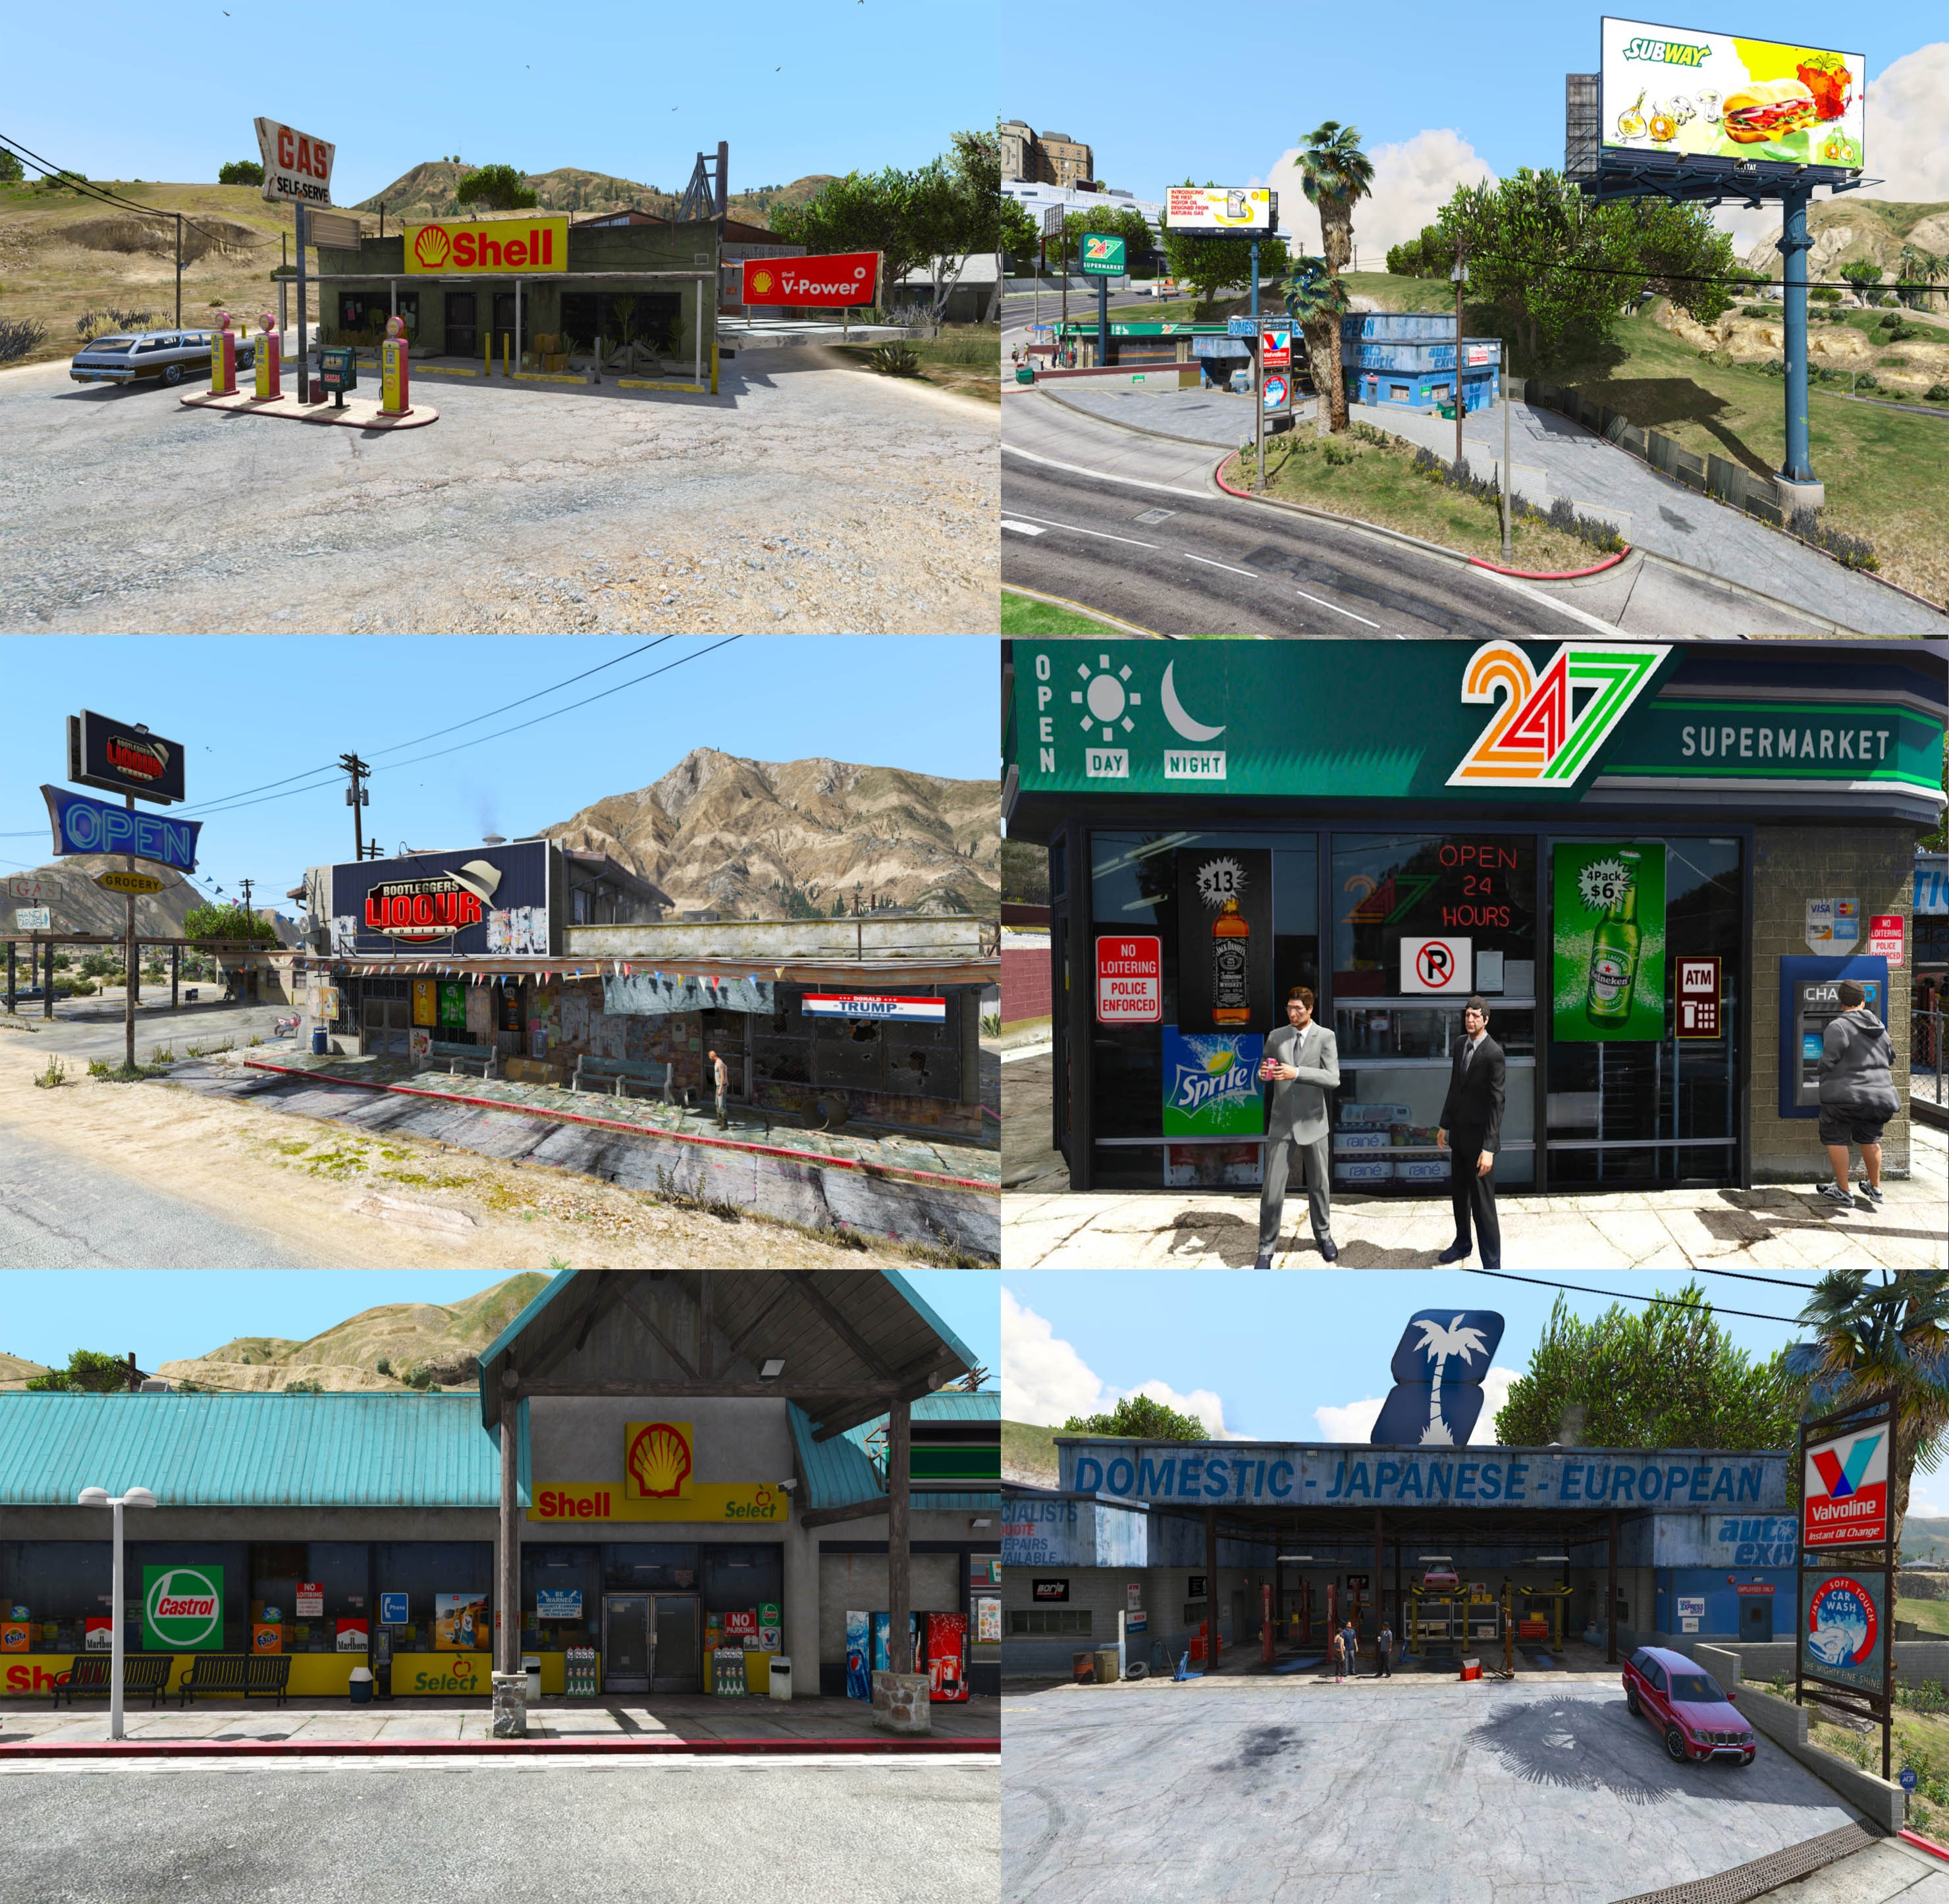 Gta 5 Garage: Real Petrol Stations